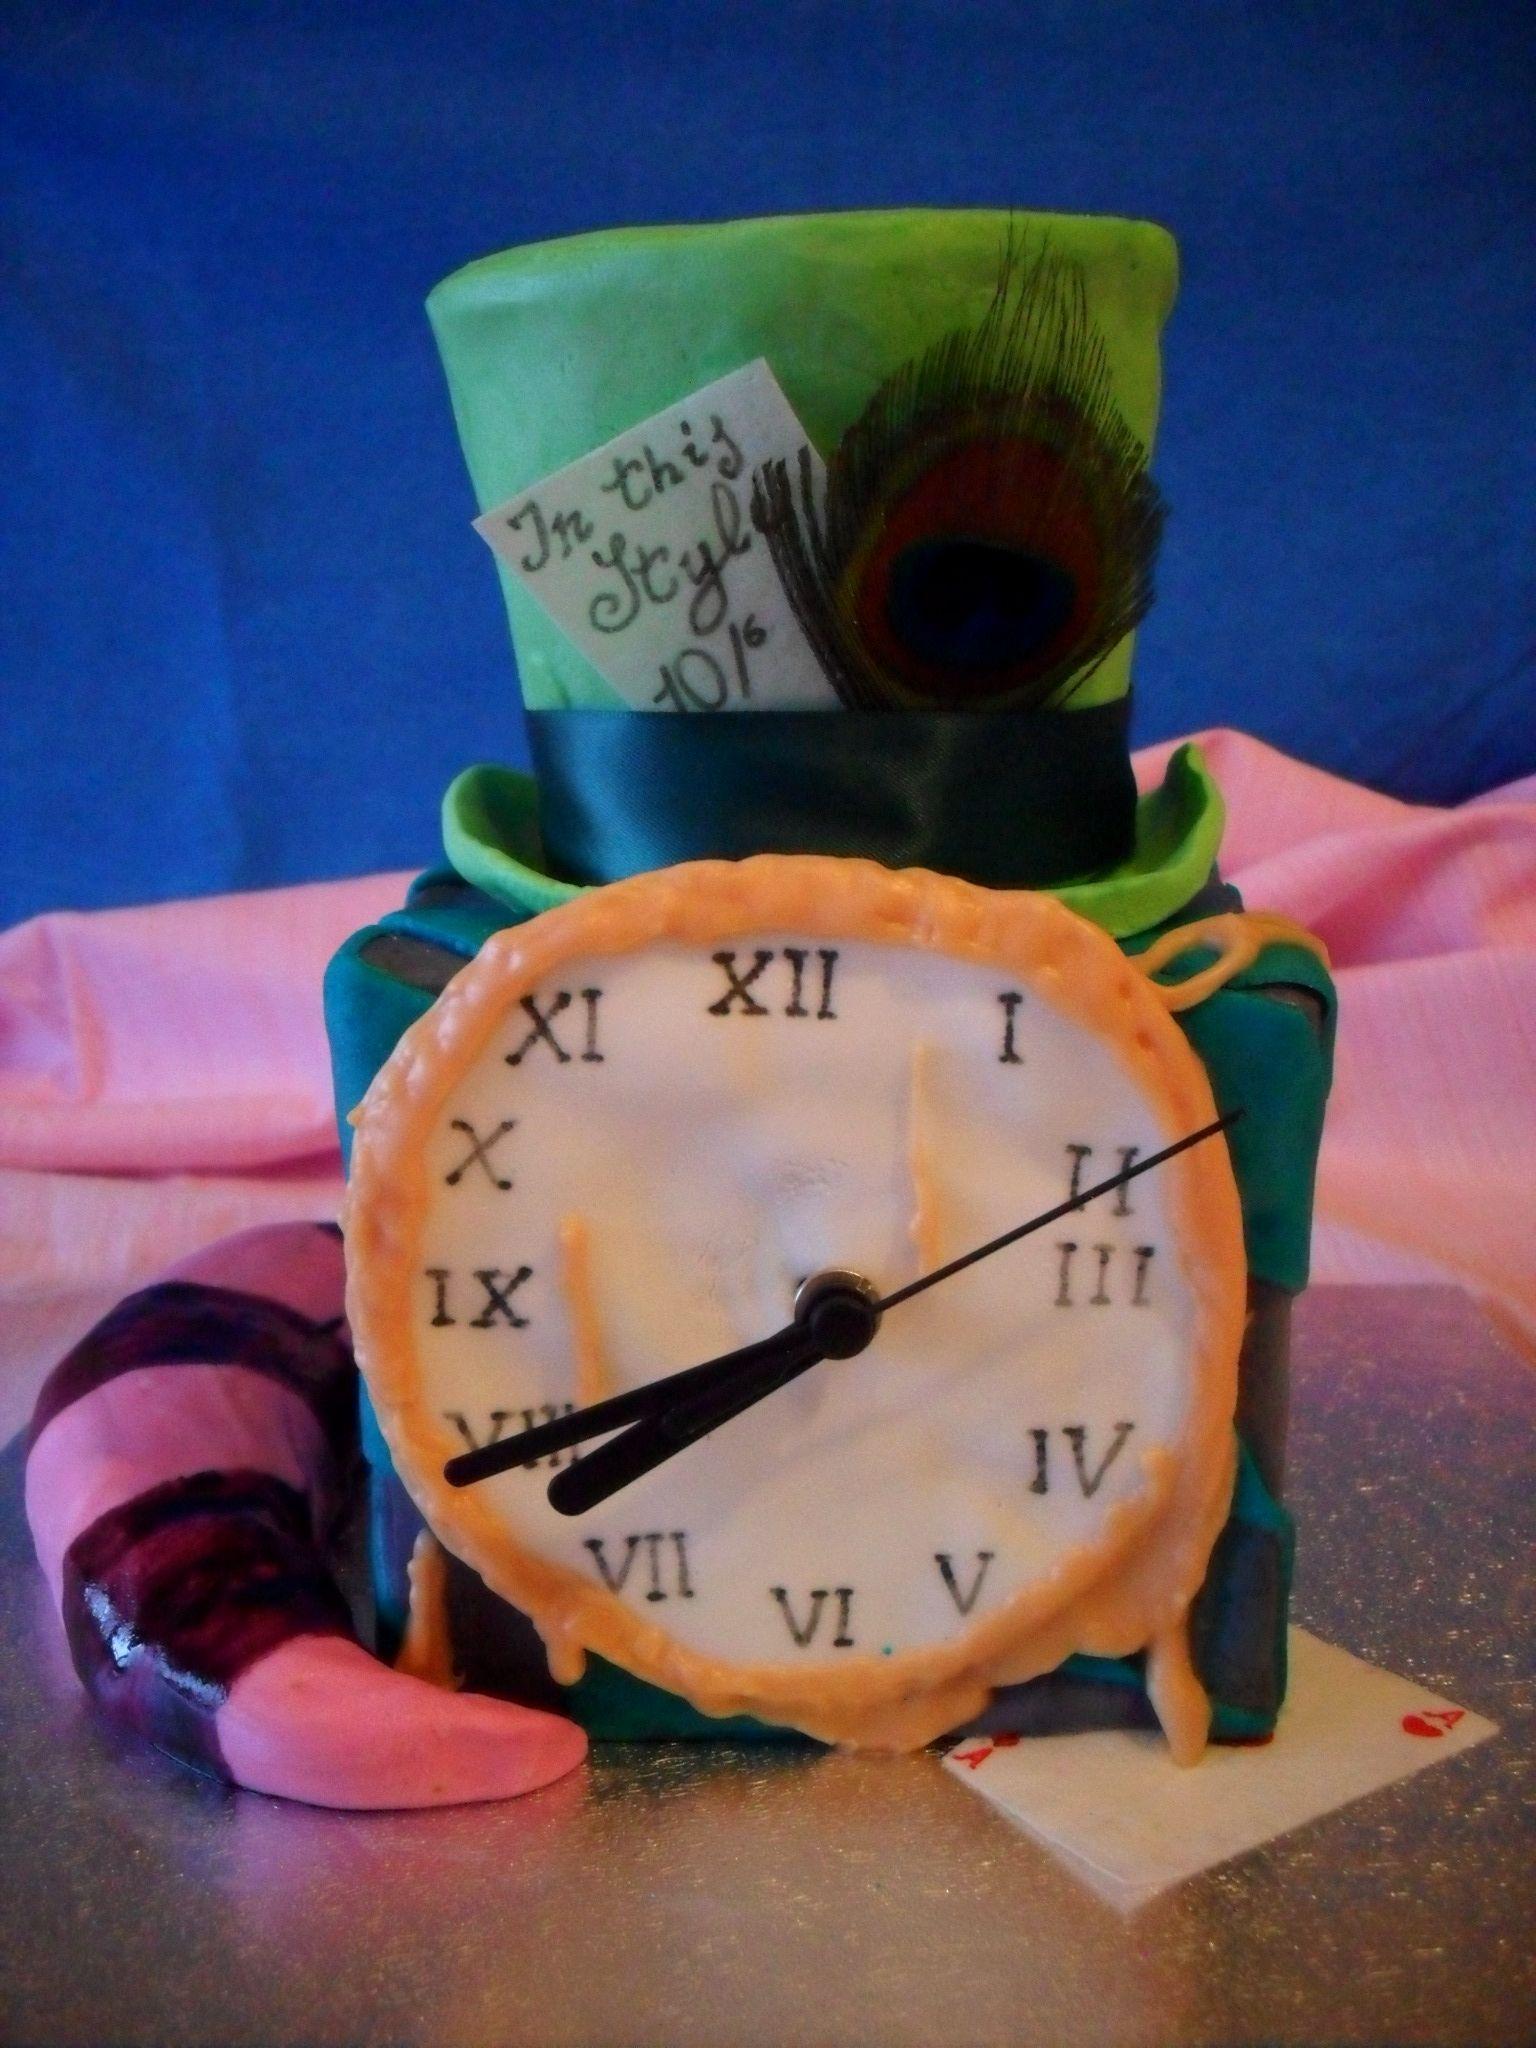 Alice in wonderland animated cake  http://lovelycake-gatta.blogspot.it/2012/04/wonderland-cake-la-mia-linea-di-torte.html